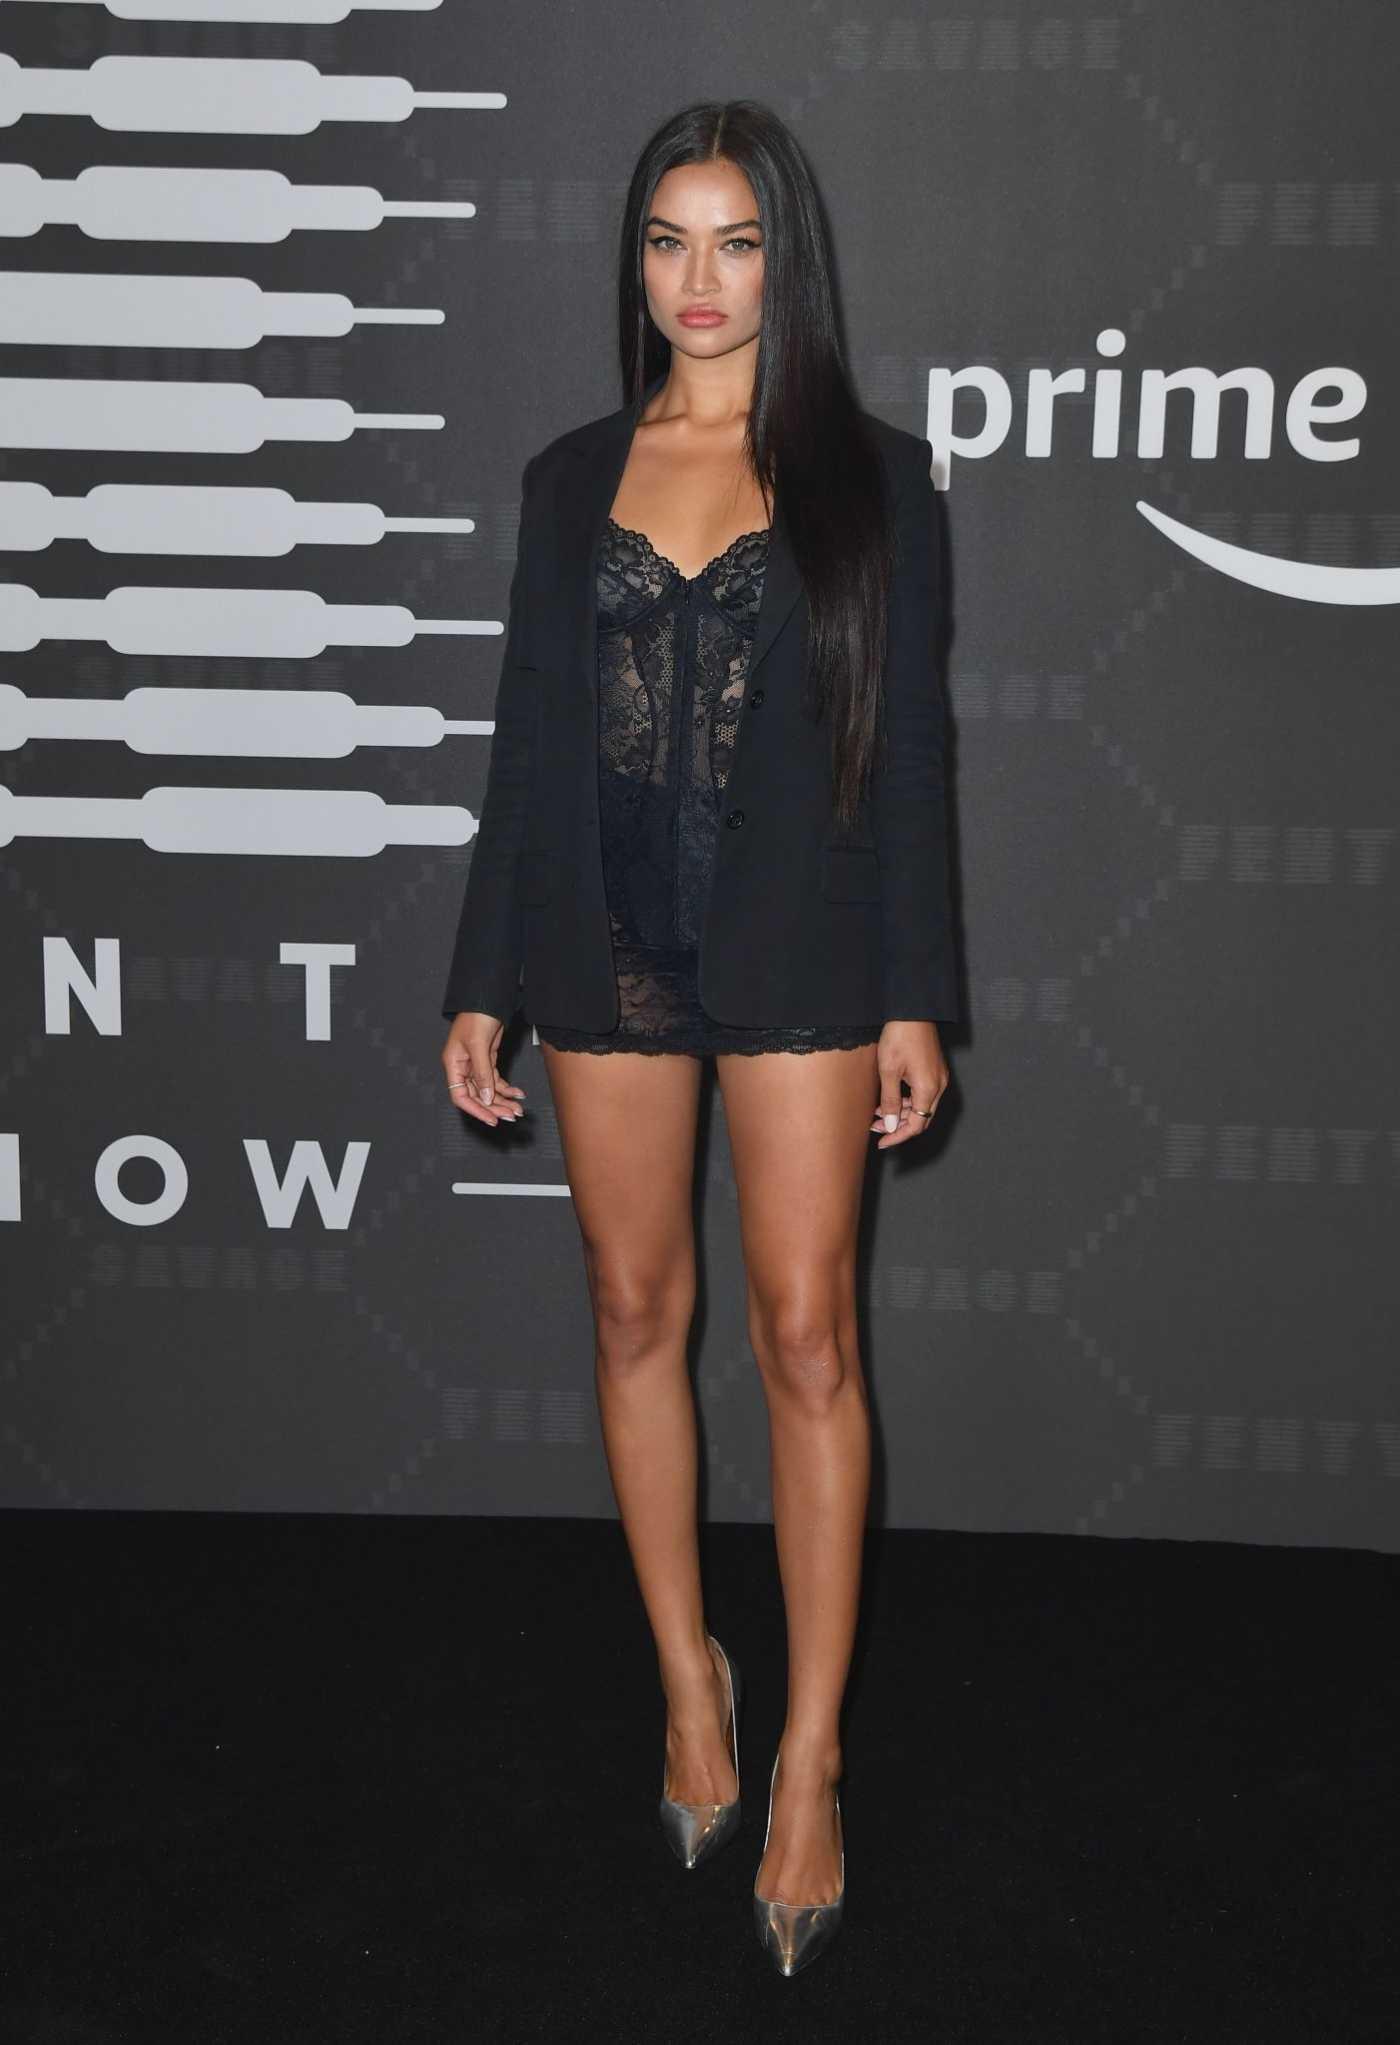 Shanina Shaik Attends Savage x Fenty Show in Brooklyn, New York 09/10/2019